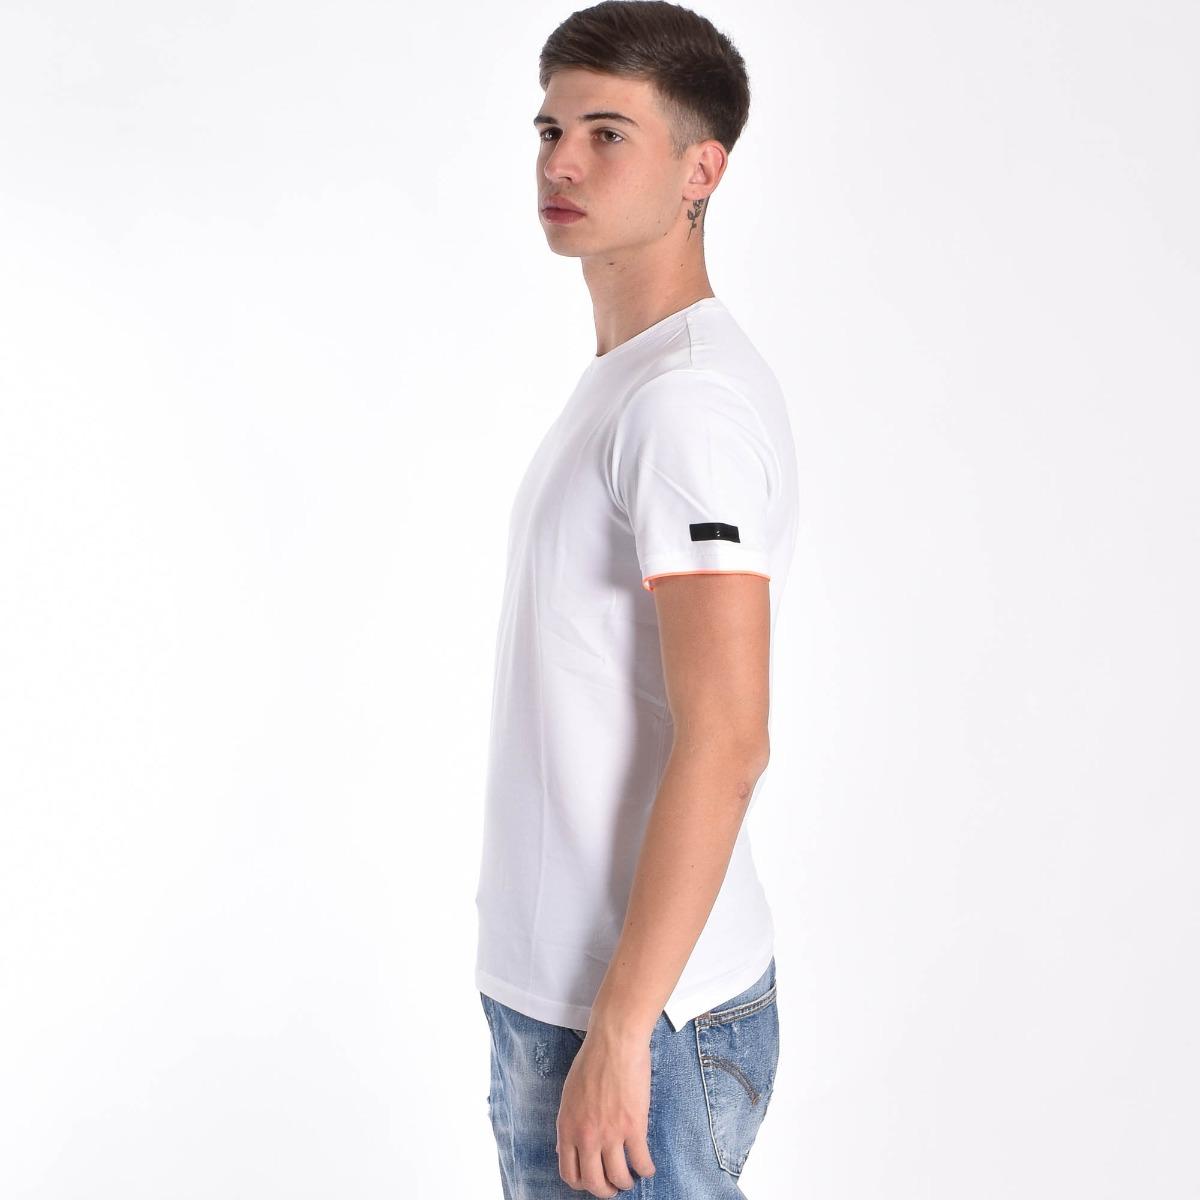 T-shirt inserti fluo- Bianco